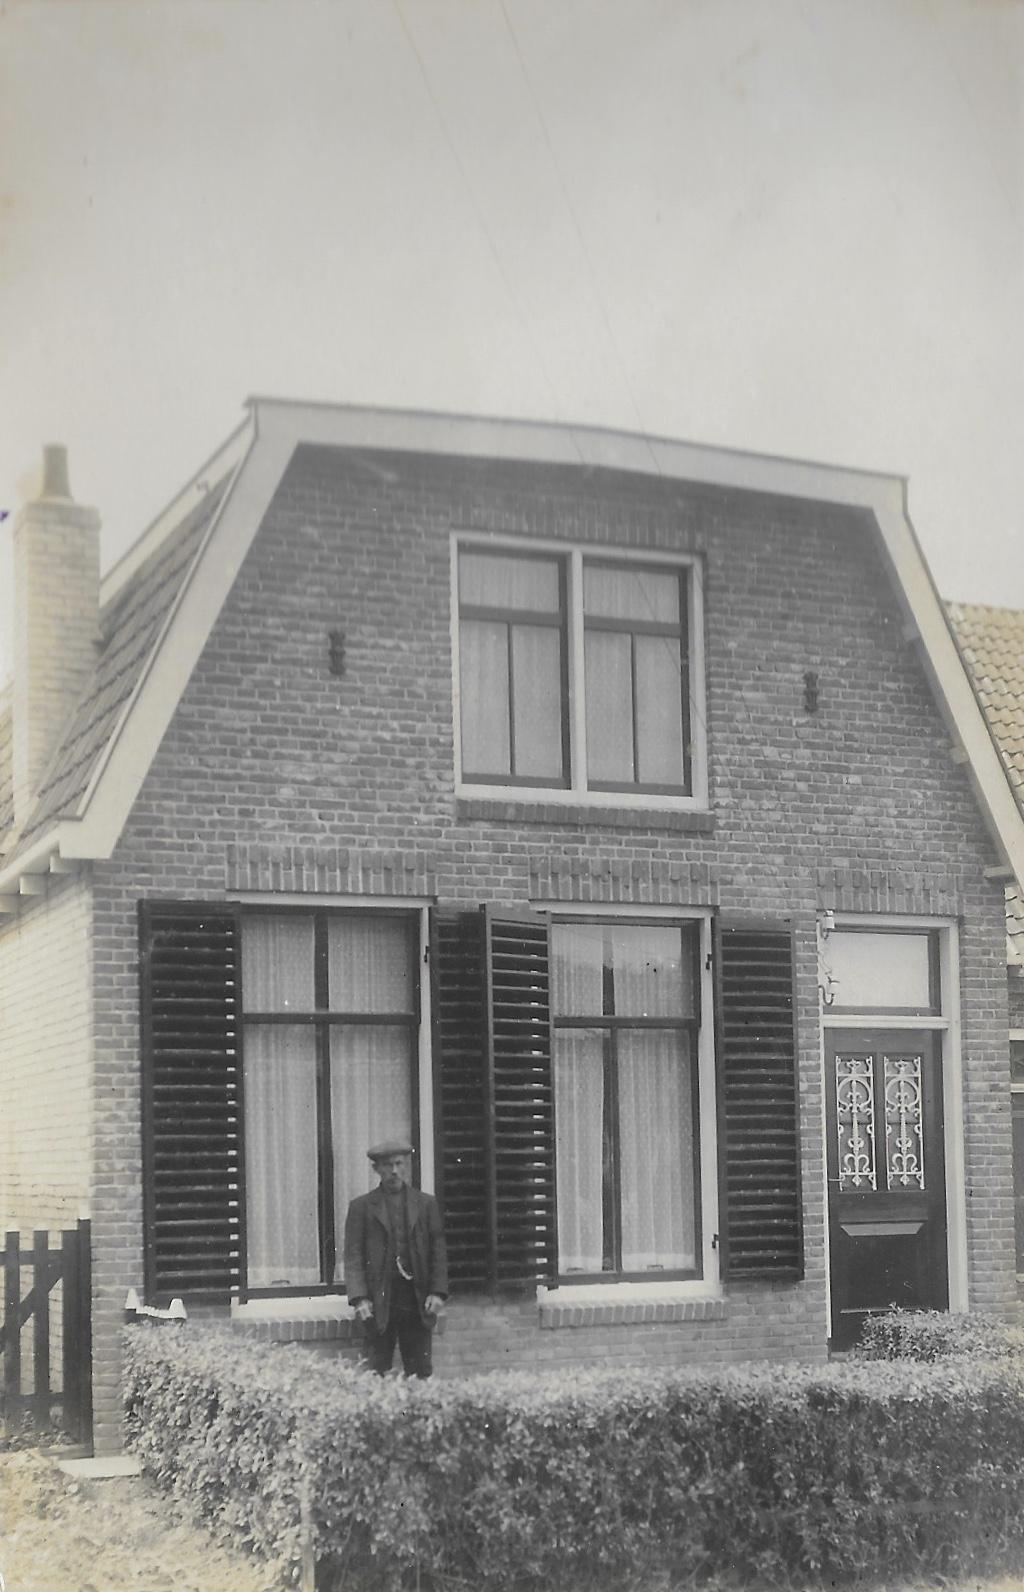 Dokkumer Nieuwe Zijlen of Engwierum?